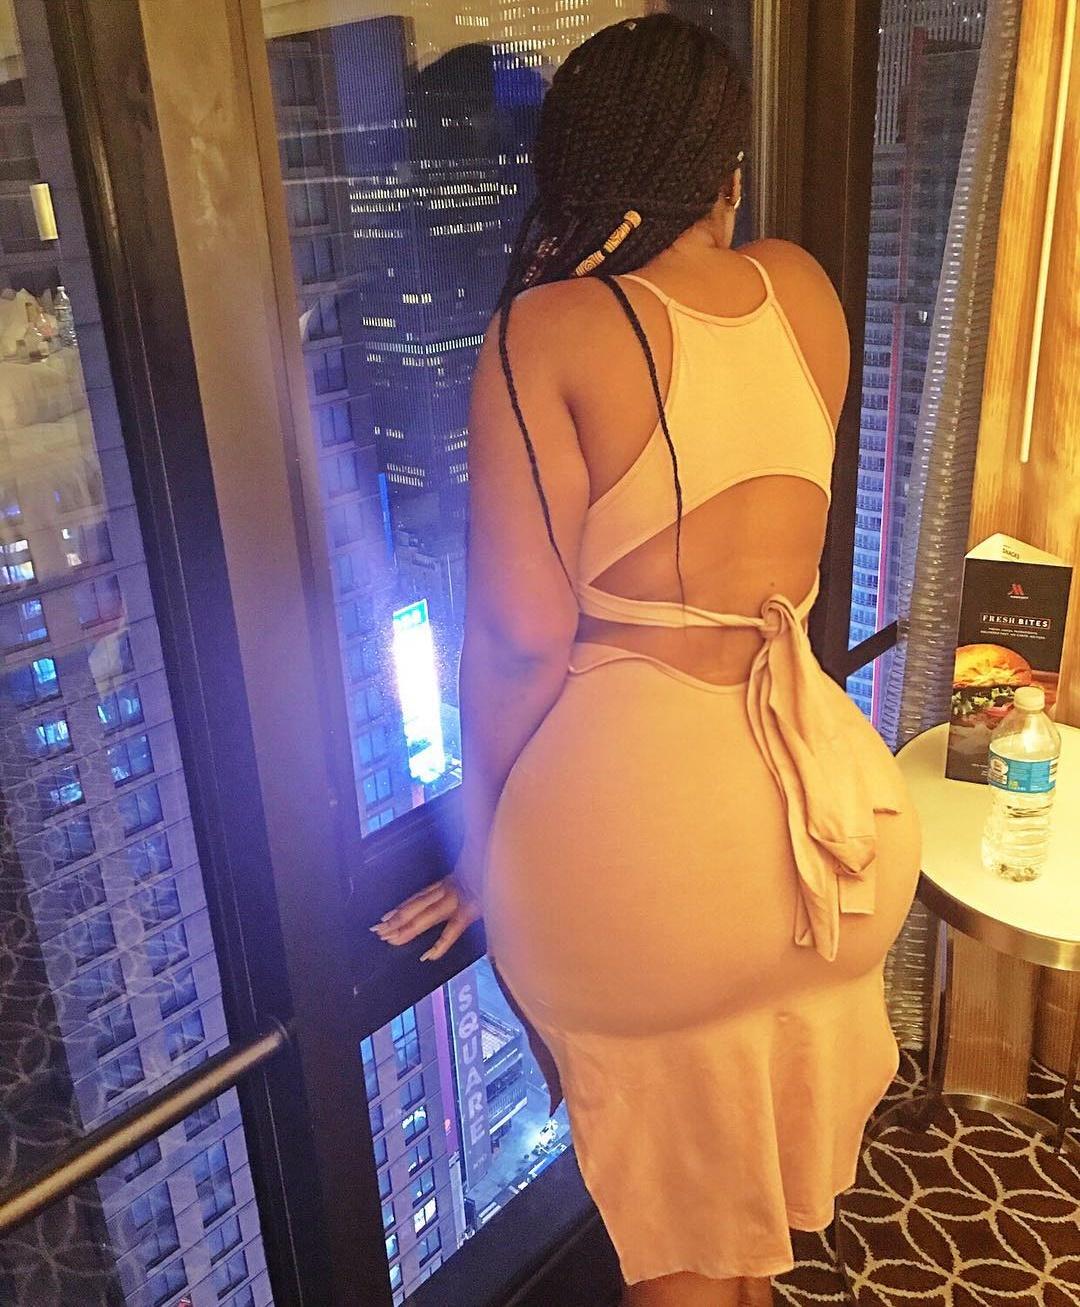 Moesha Boduong Puts Her Enormous Butt On Display (1)